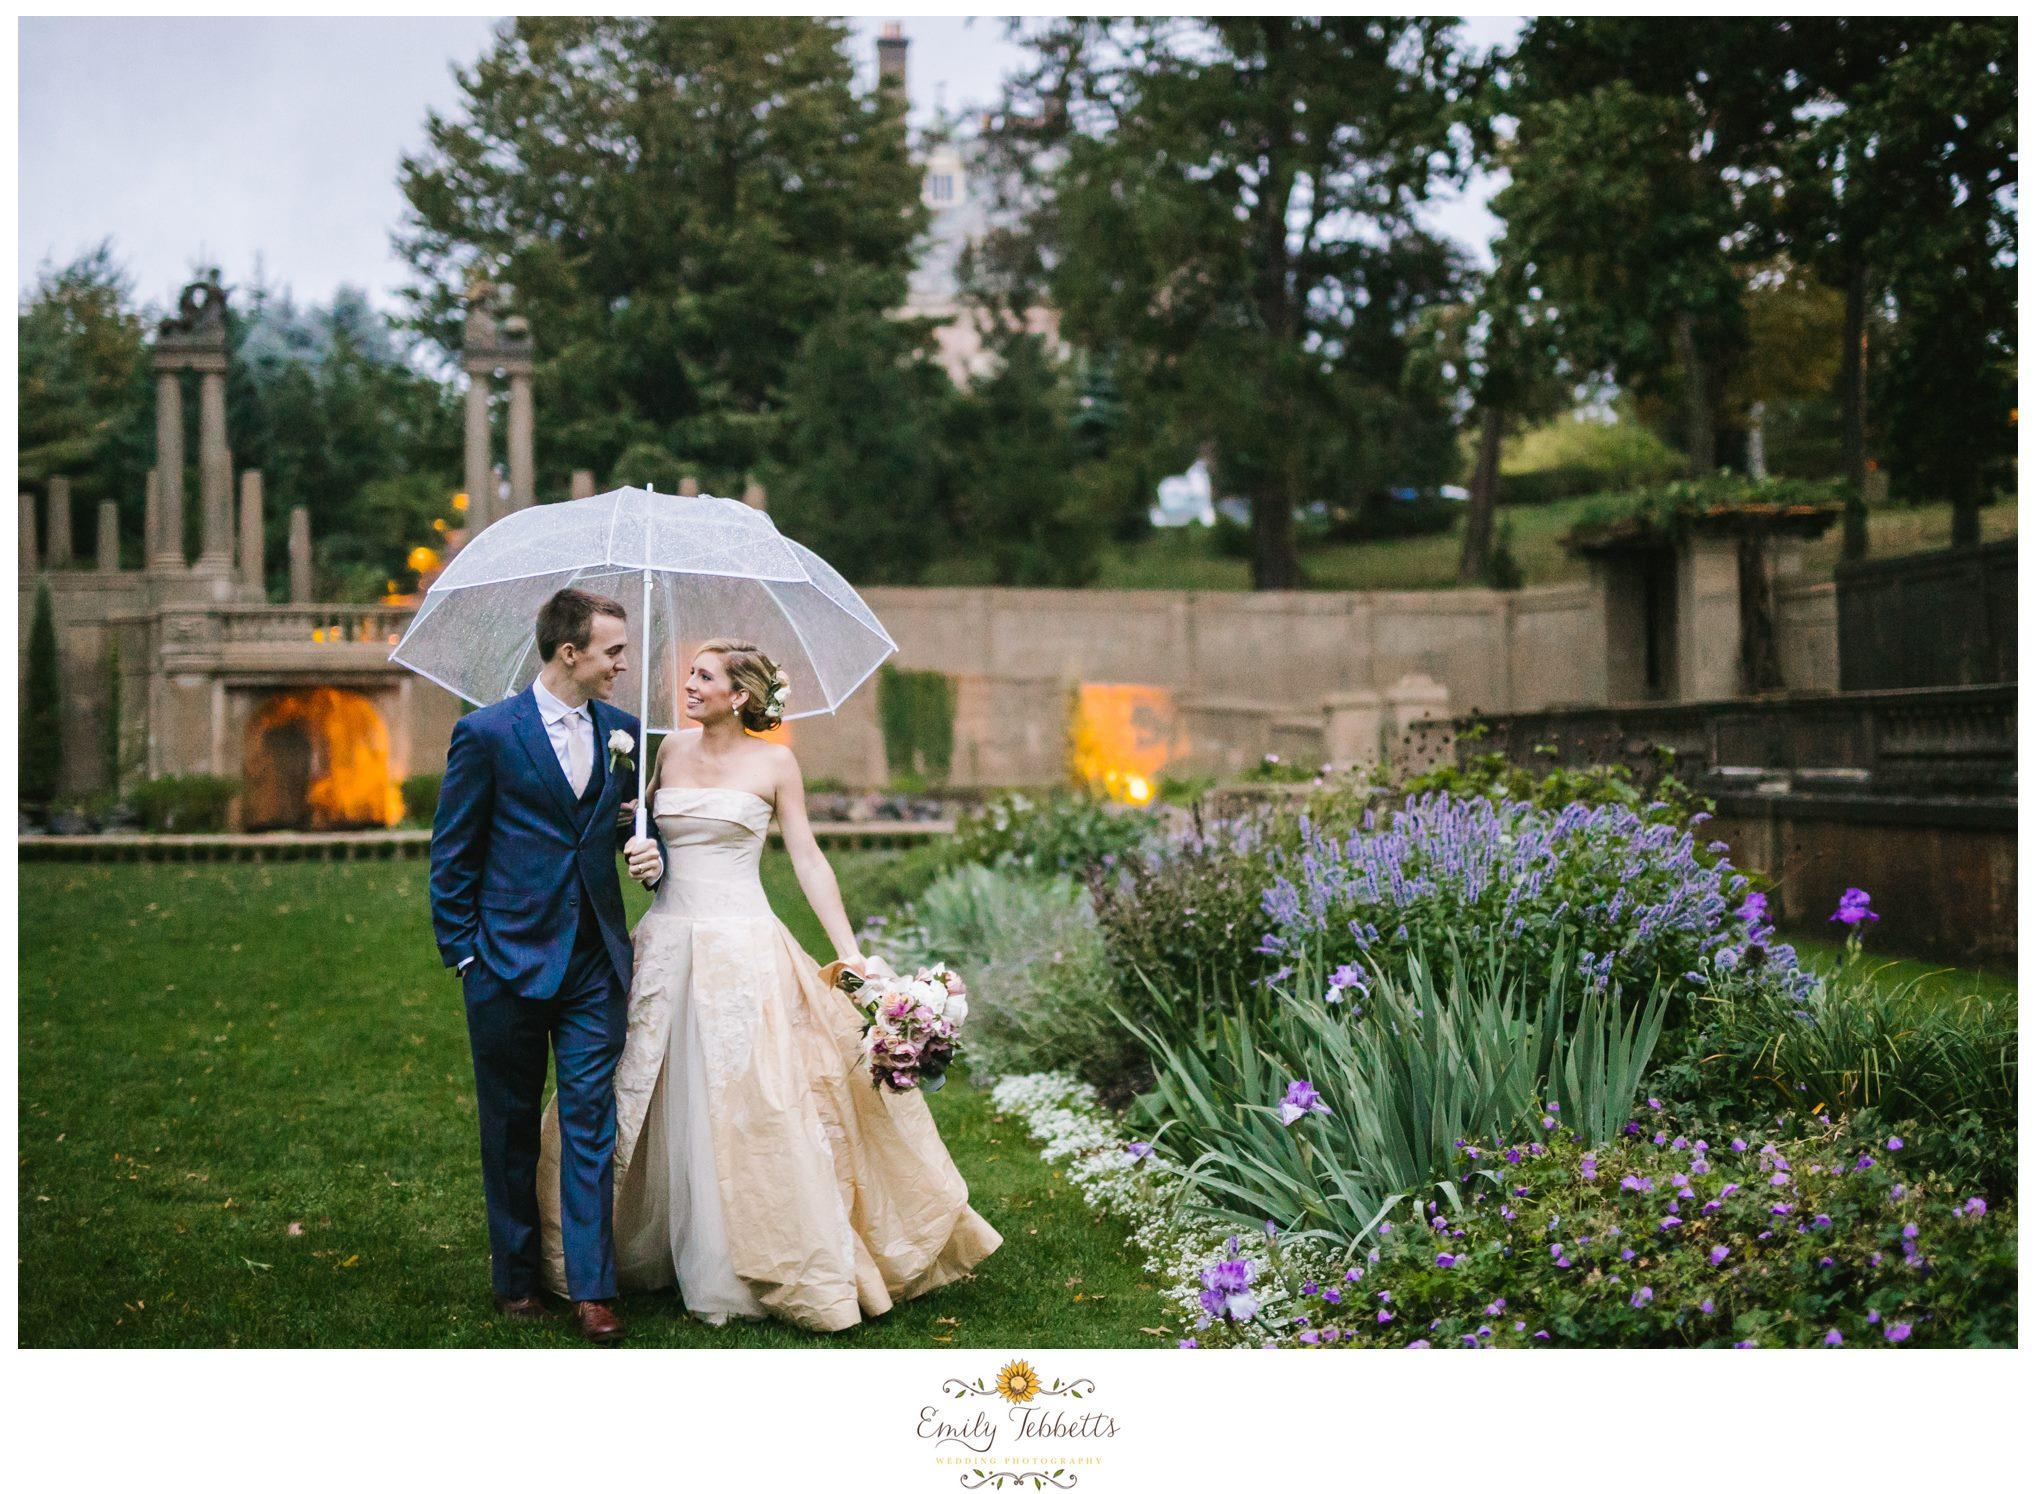 Crane Estate, Ipswich, MA - Emily Tebbetts Wedding Photography 2.jpg